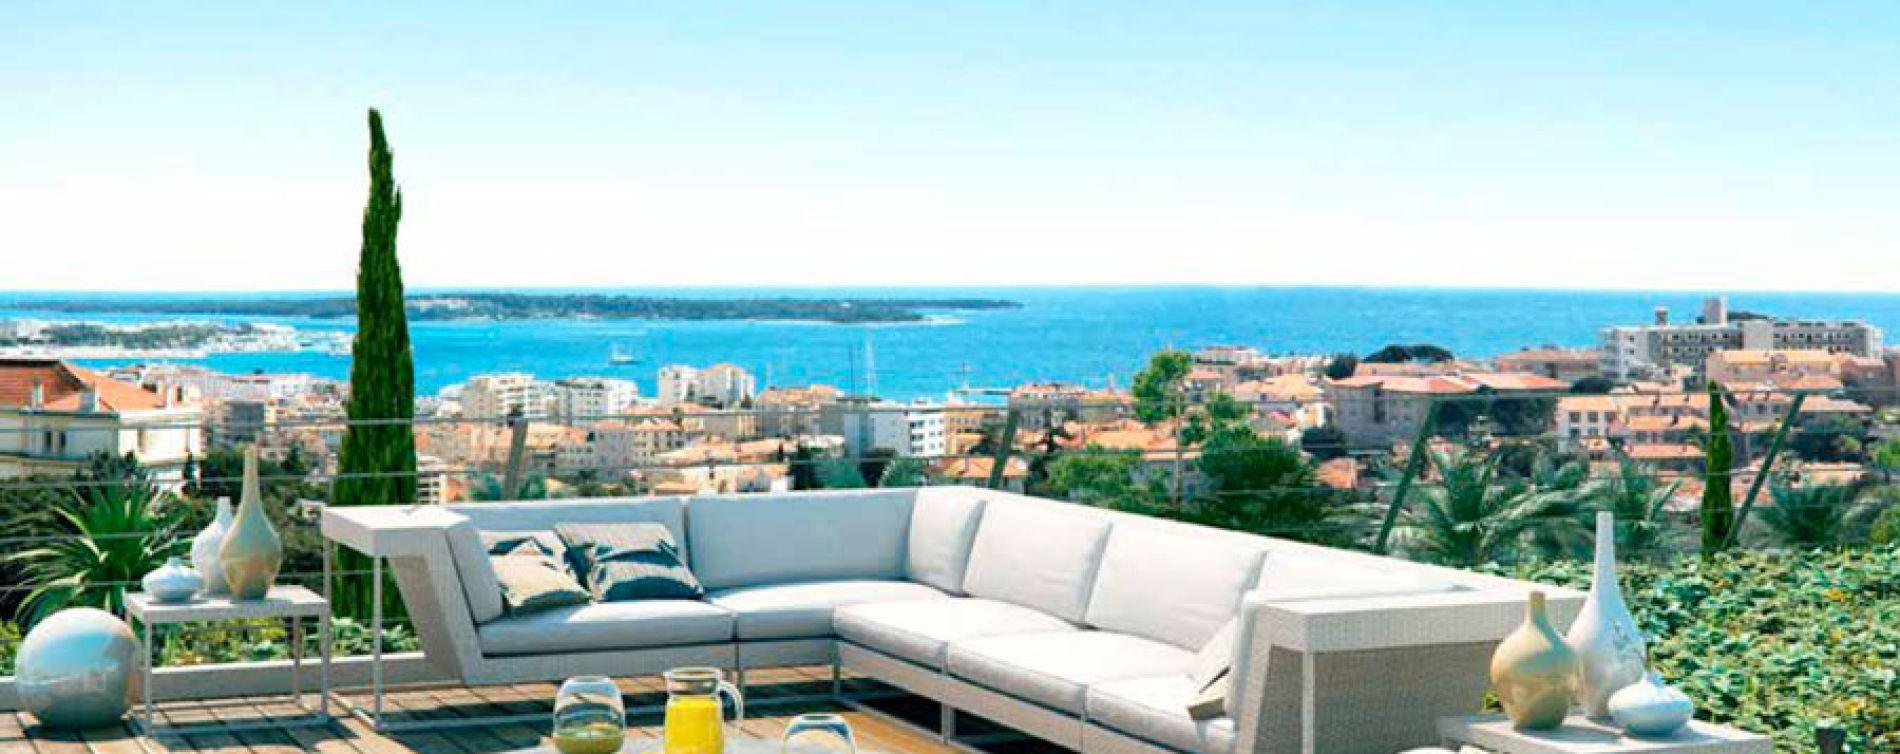 Résidence Horizon Bay à Cannes